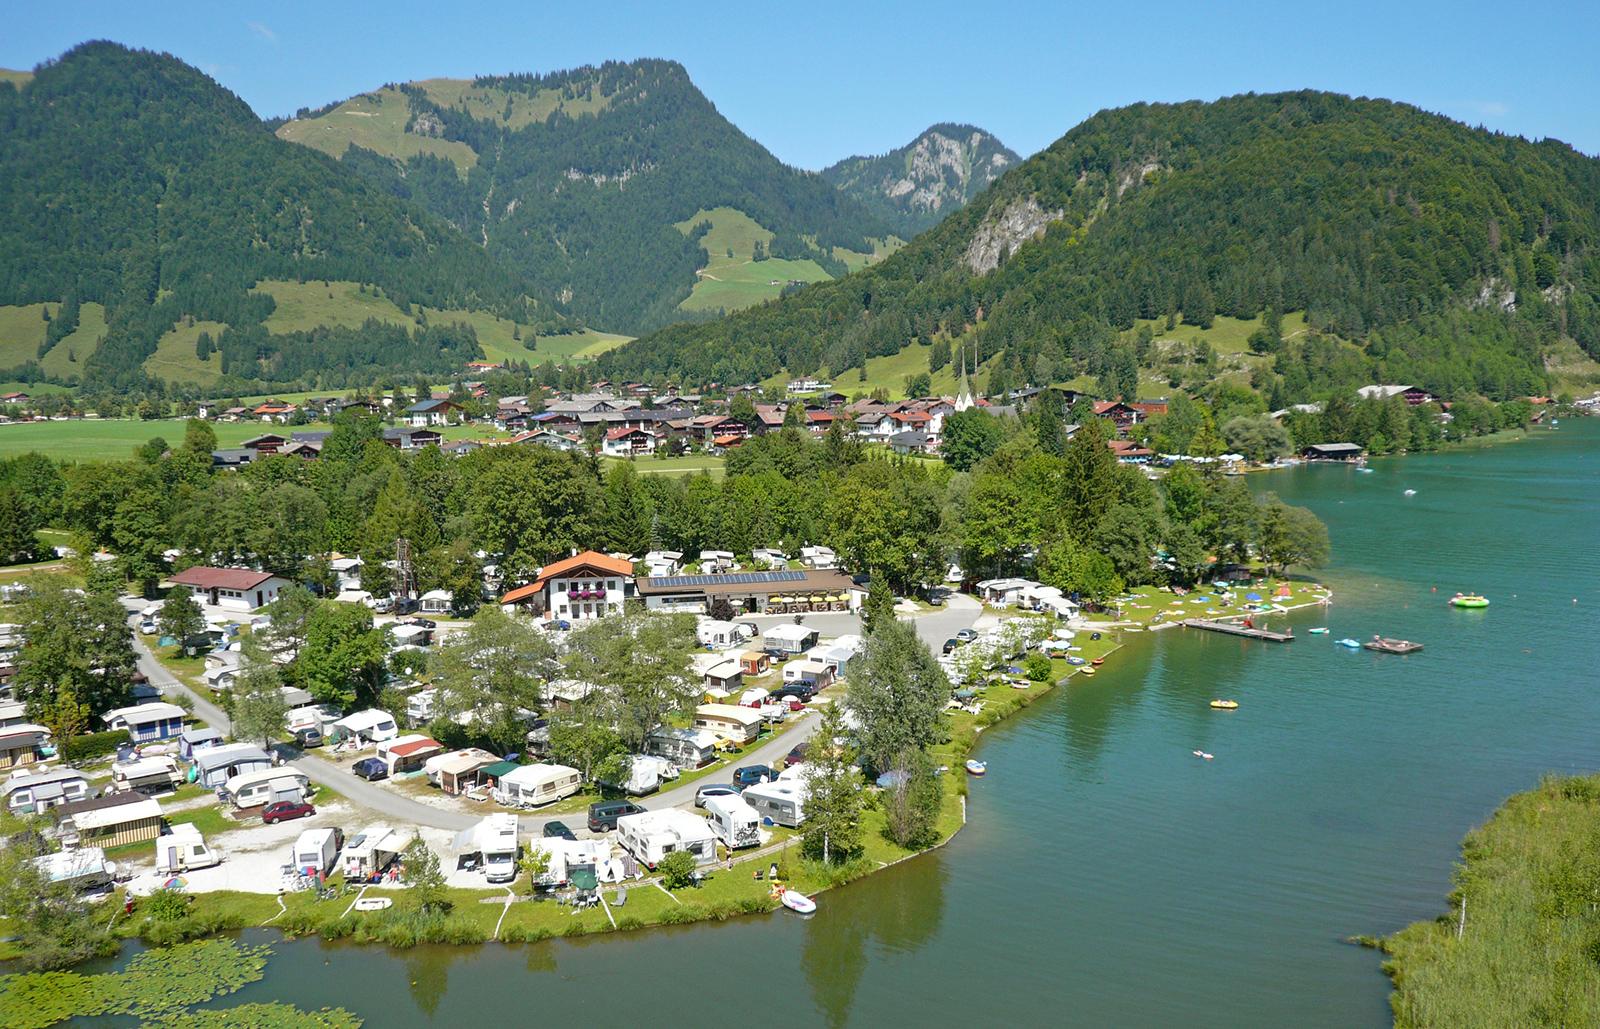 camping-seespitz-luftbild-sommer